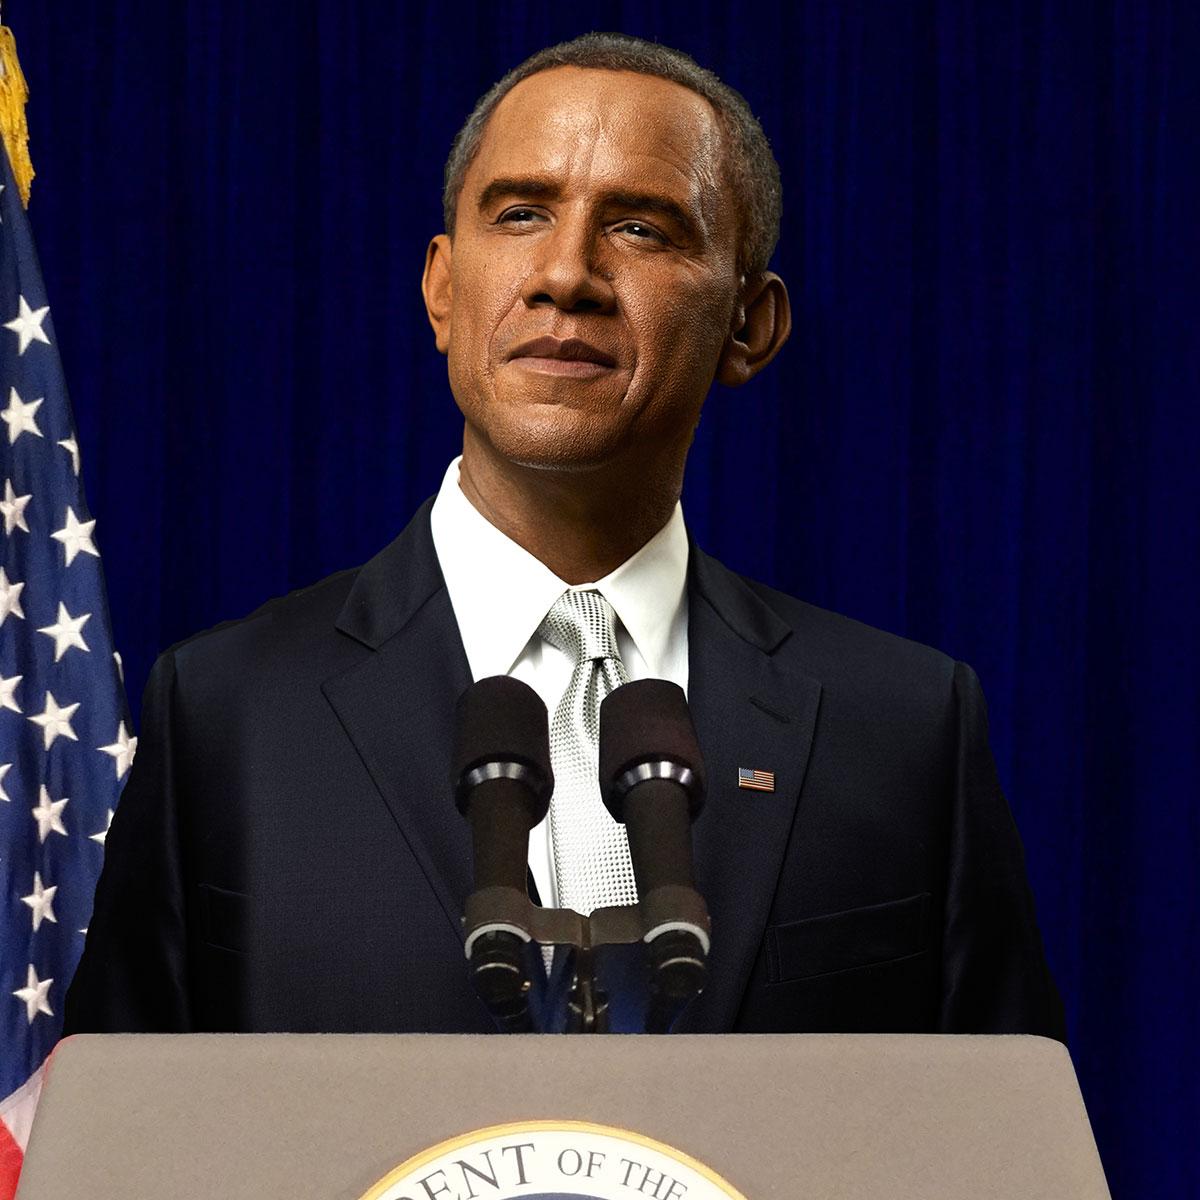 Steve Bridges, Barack Obama